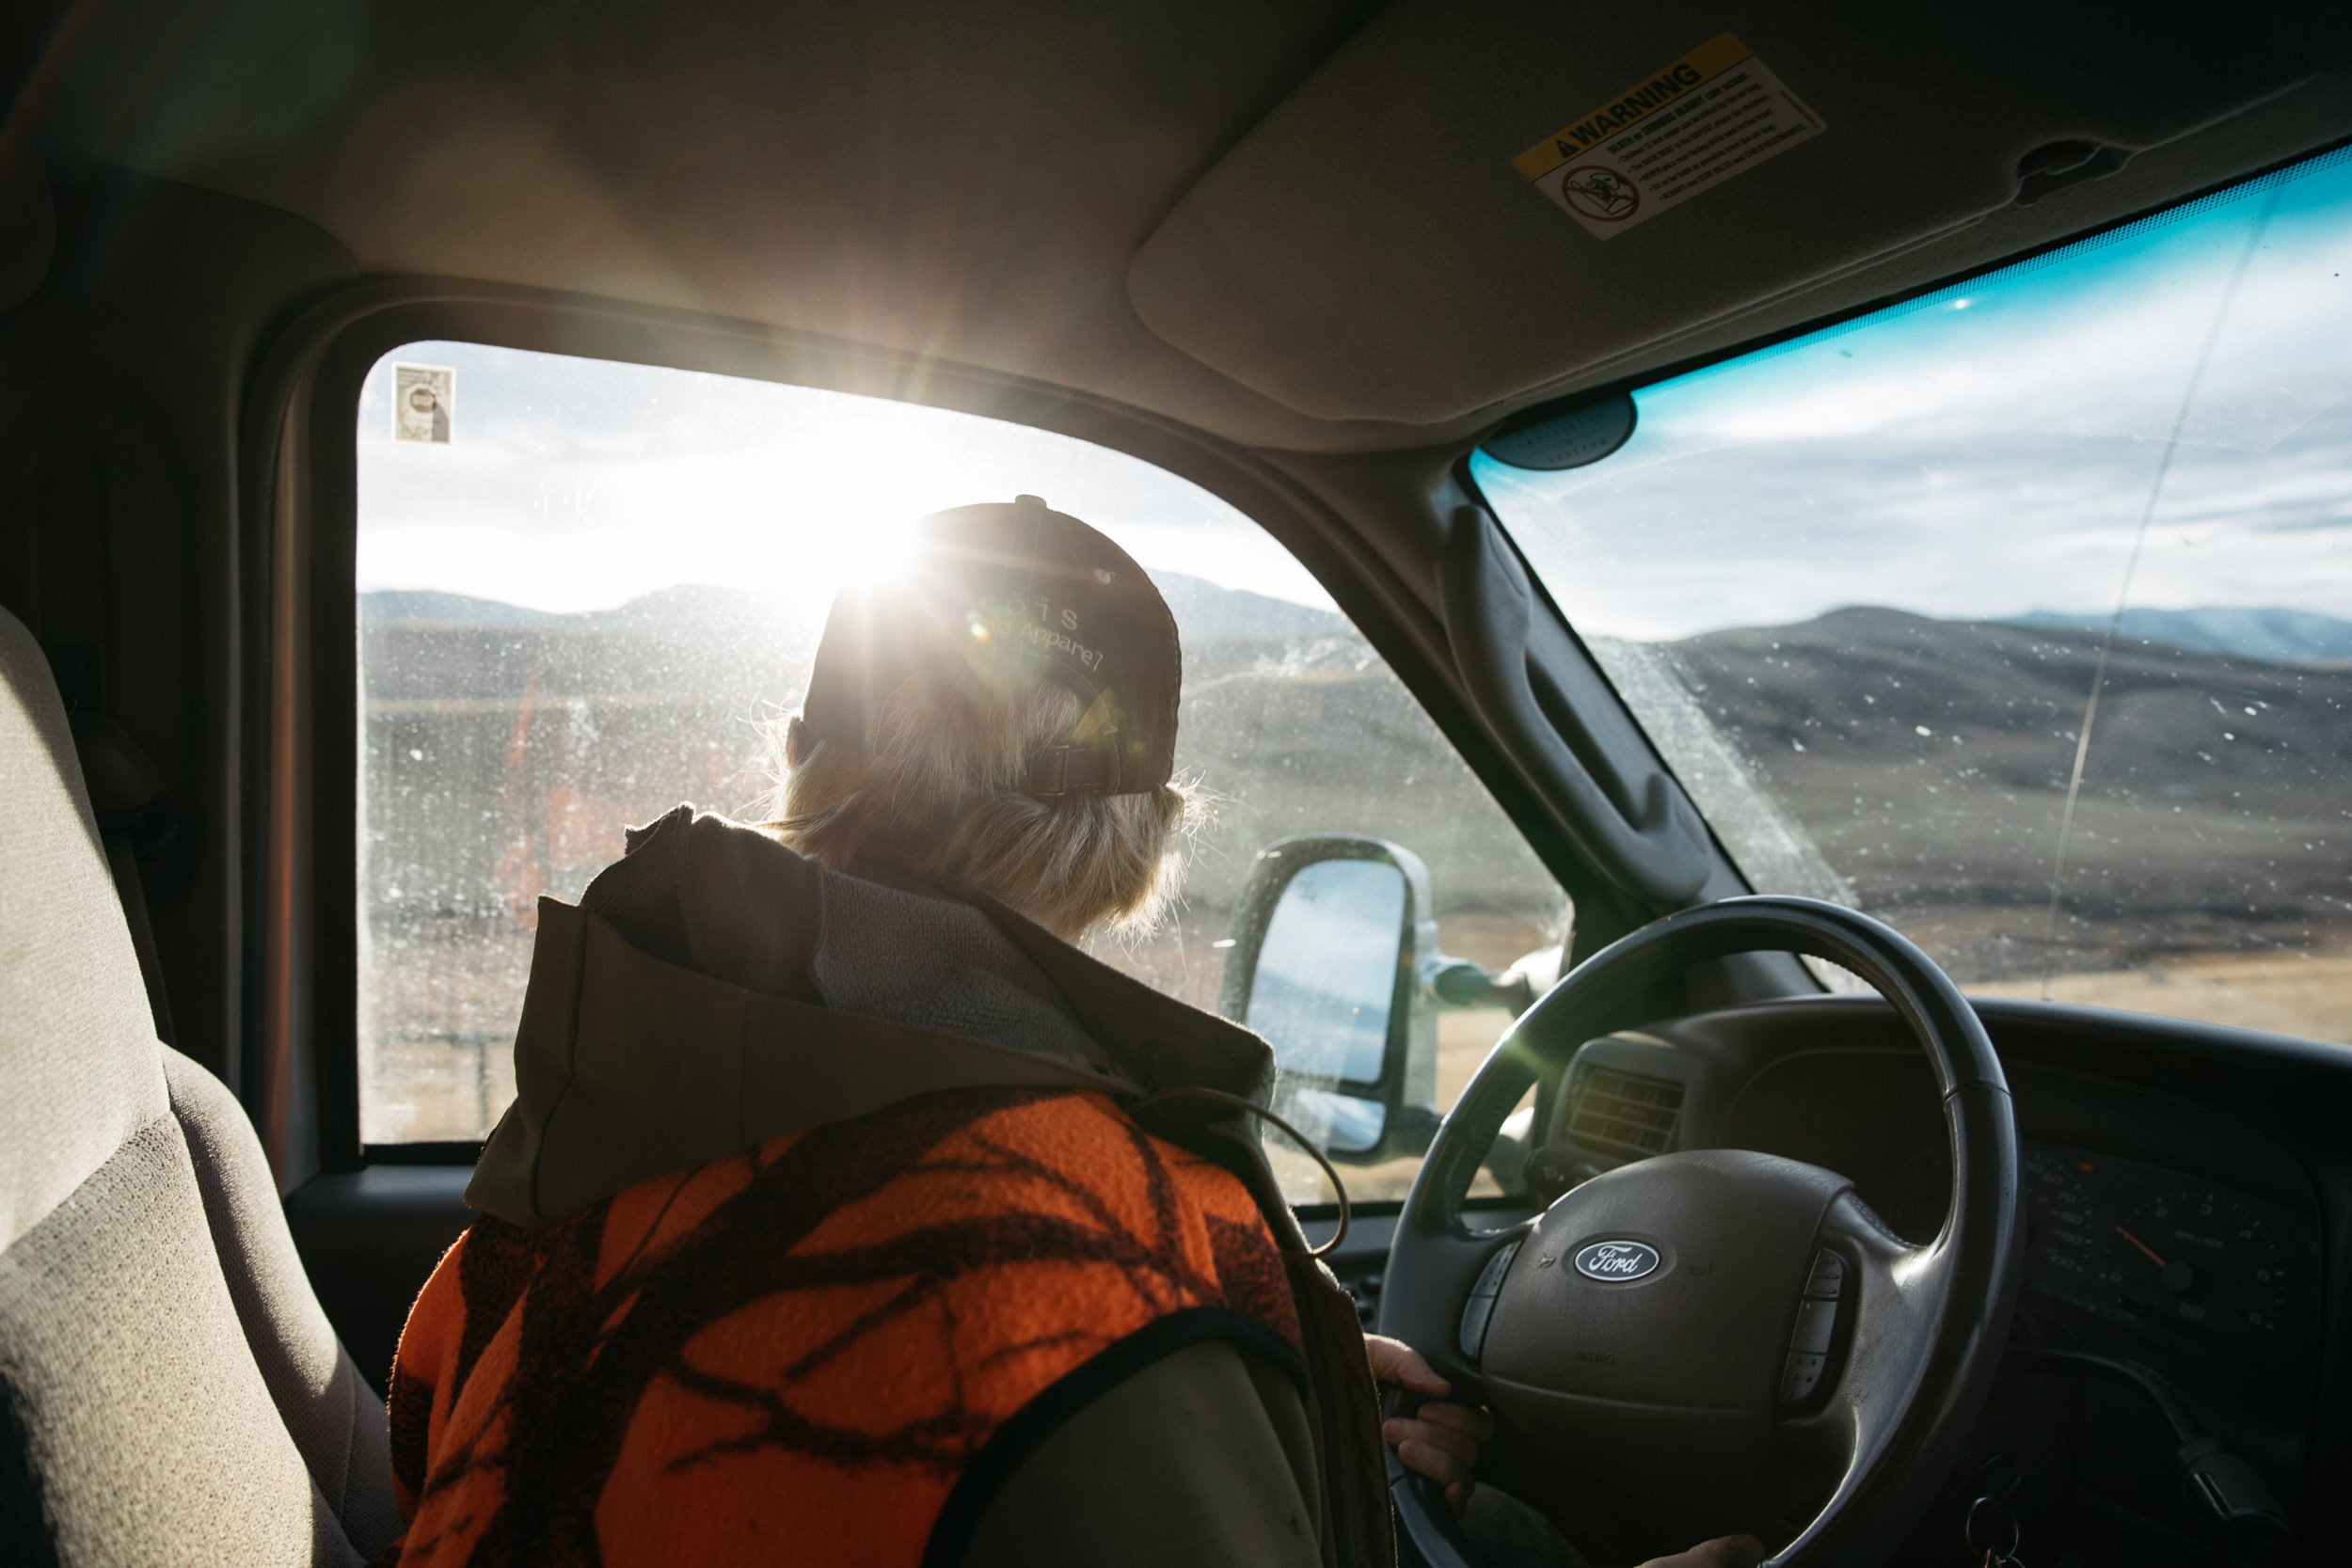 Hunter with blaze orange vest looking out of truck window